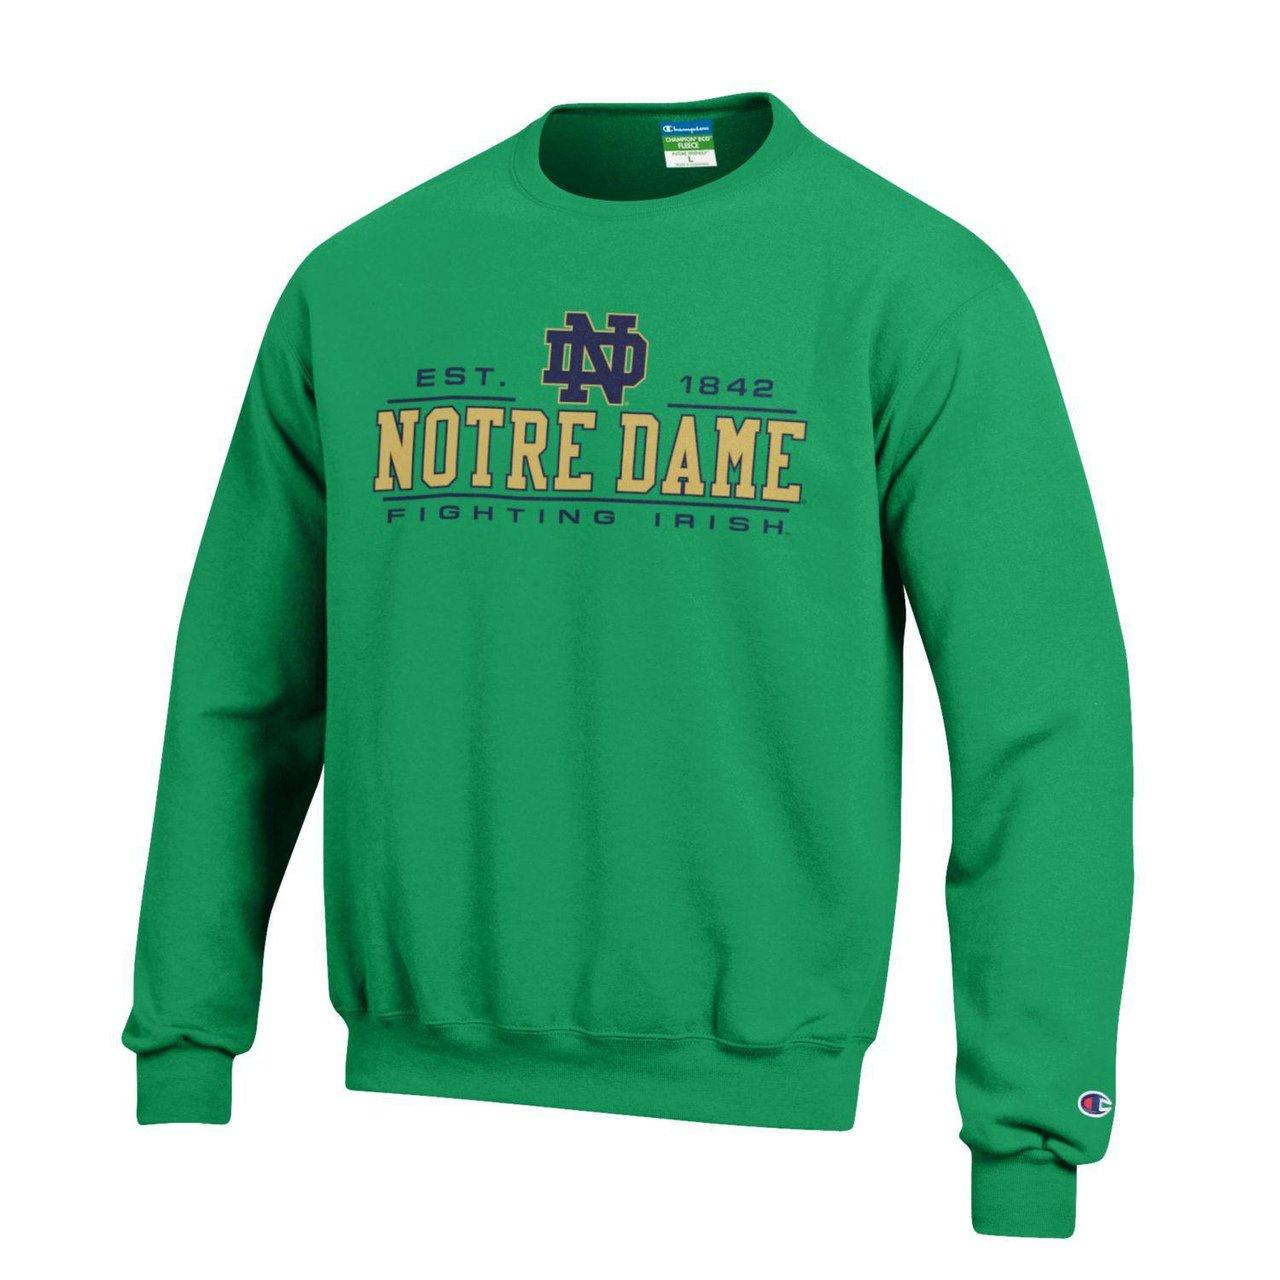 Amazon.com : Champion Notre Dame Fighting Irish Adult Powerblend ...